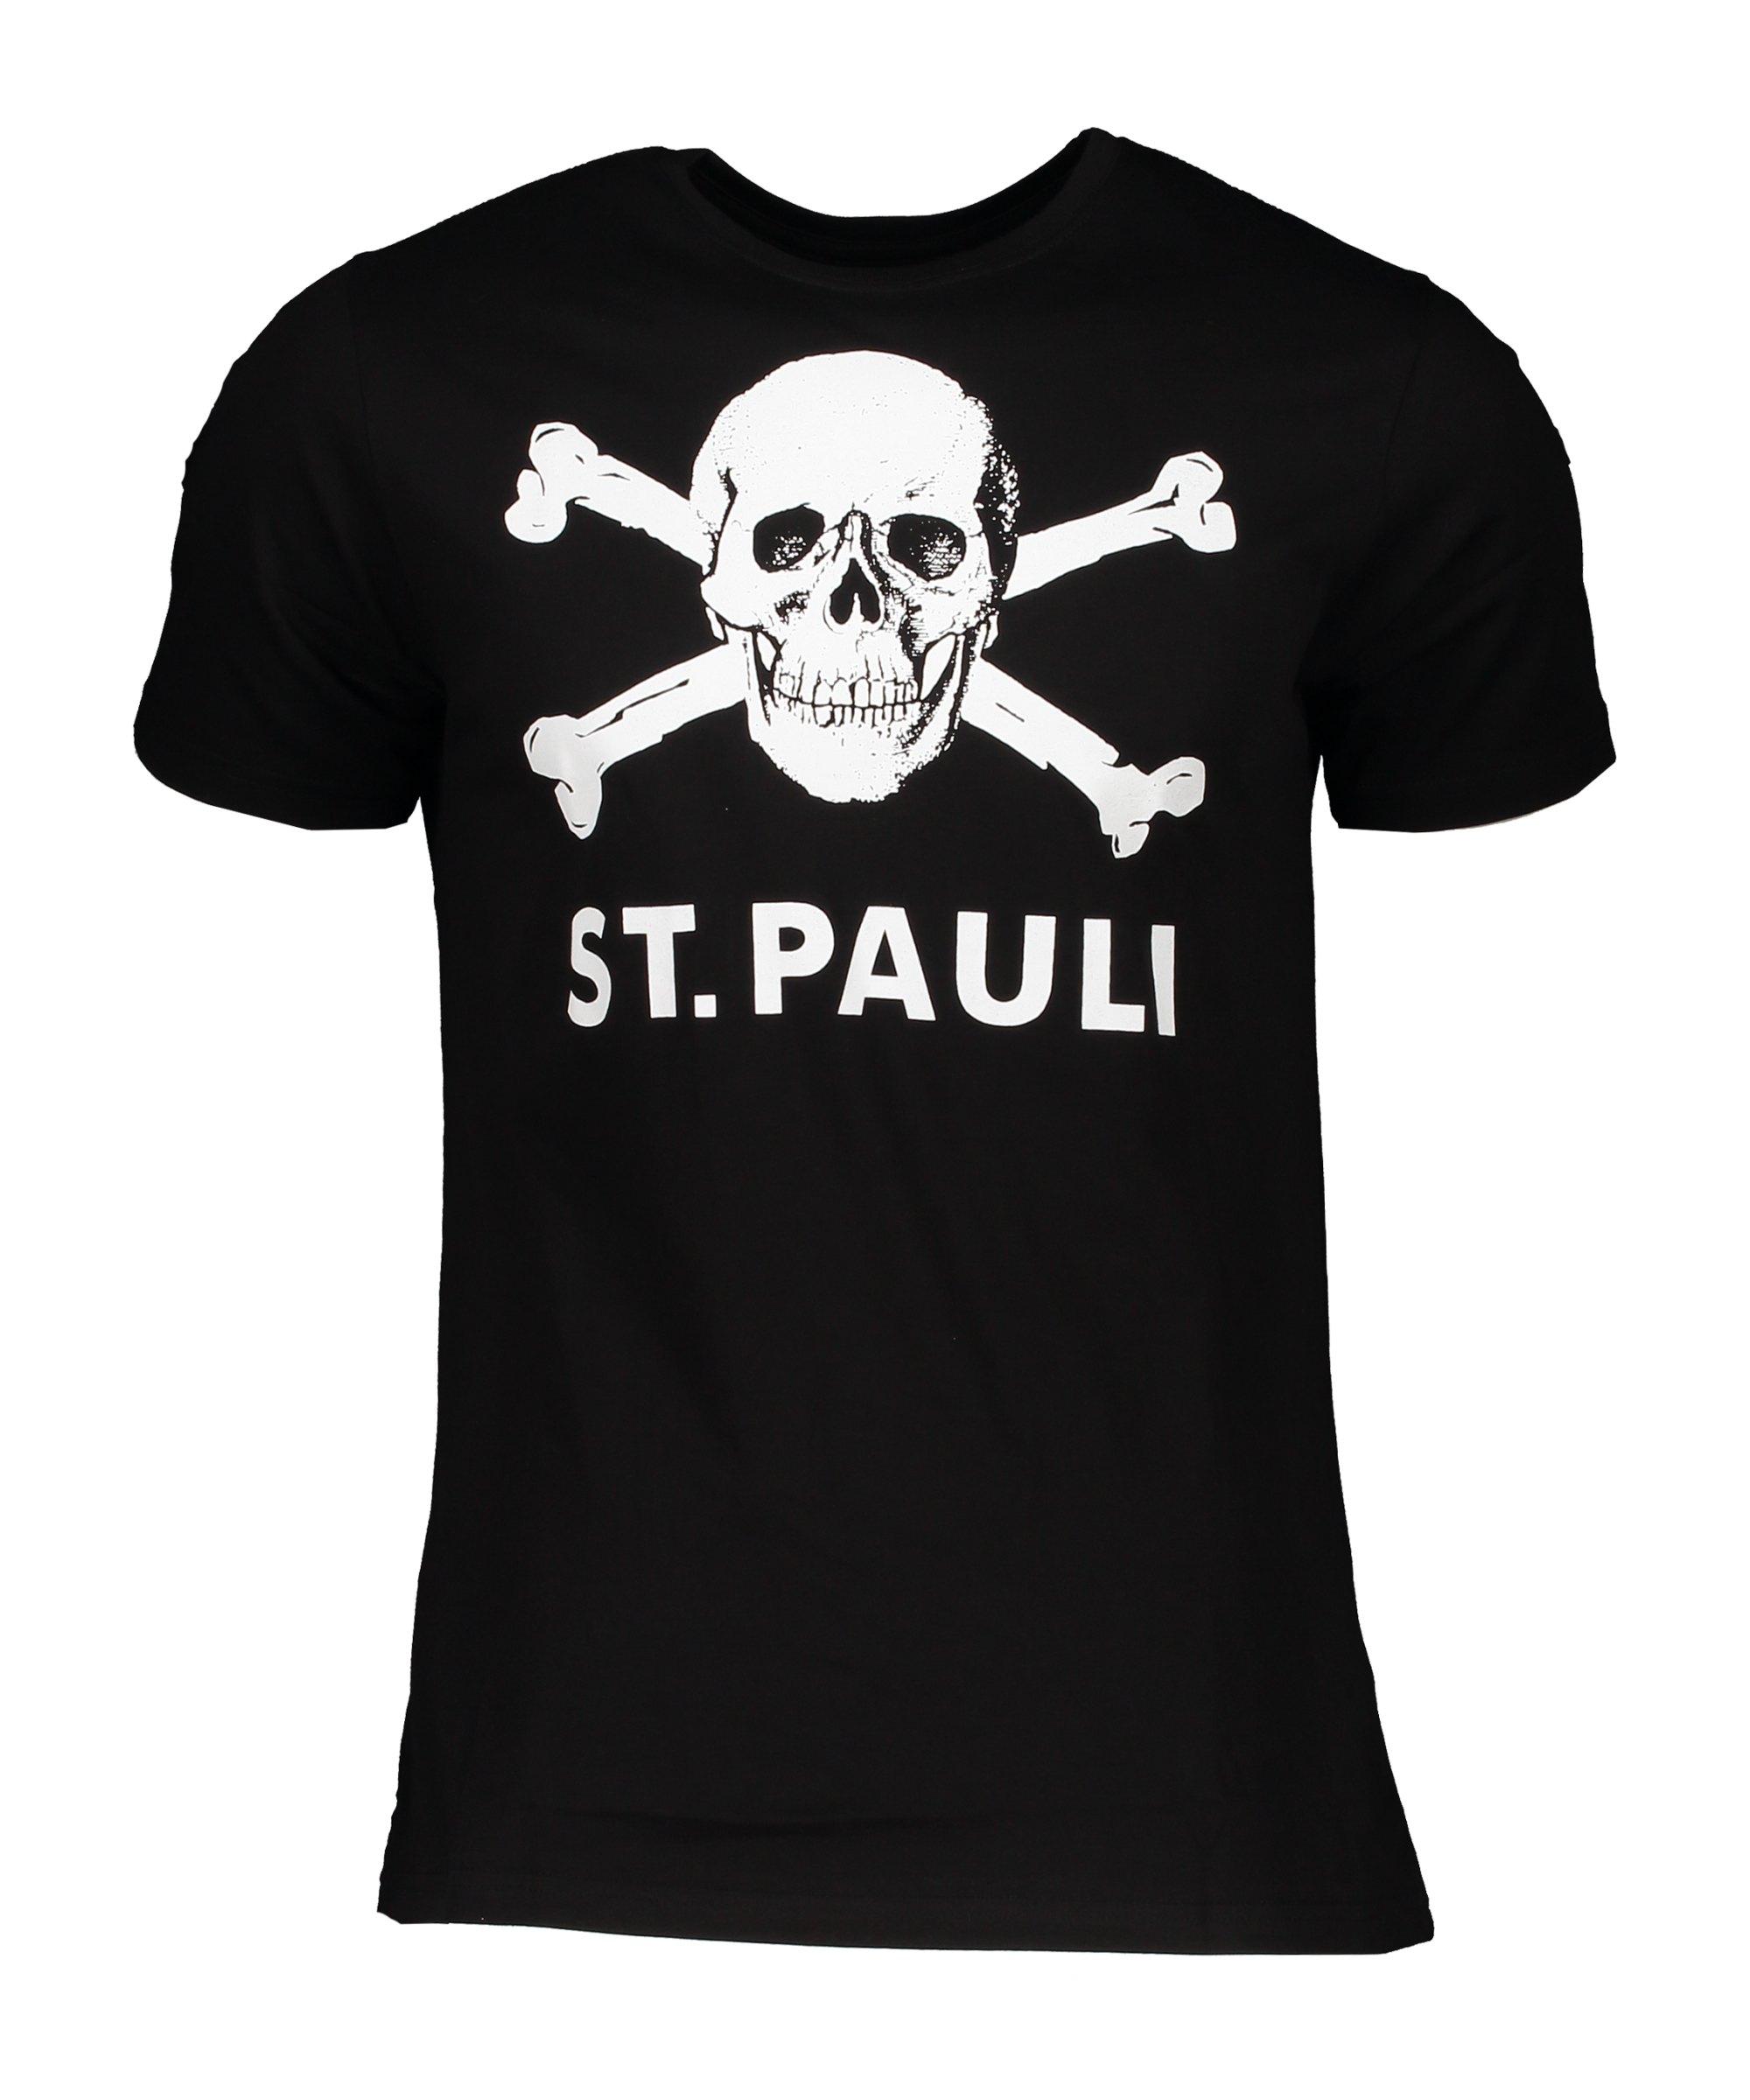 FC St. Pauli Totenkopf I T-Shirt Schwarz - schwarz